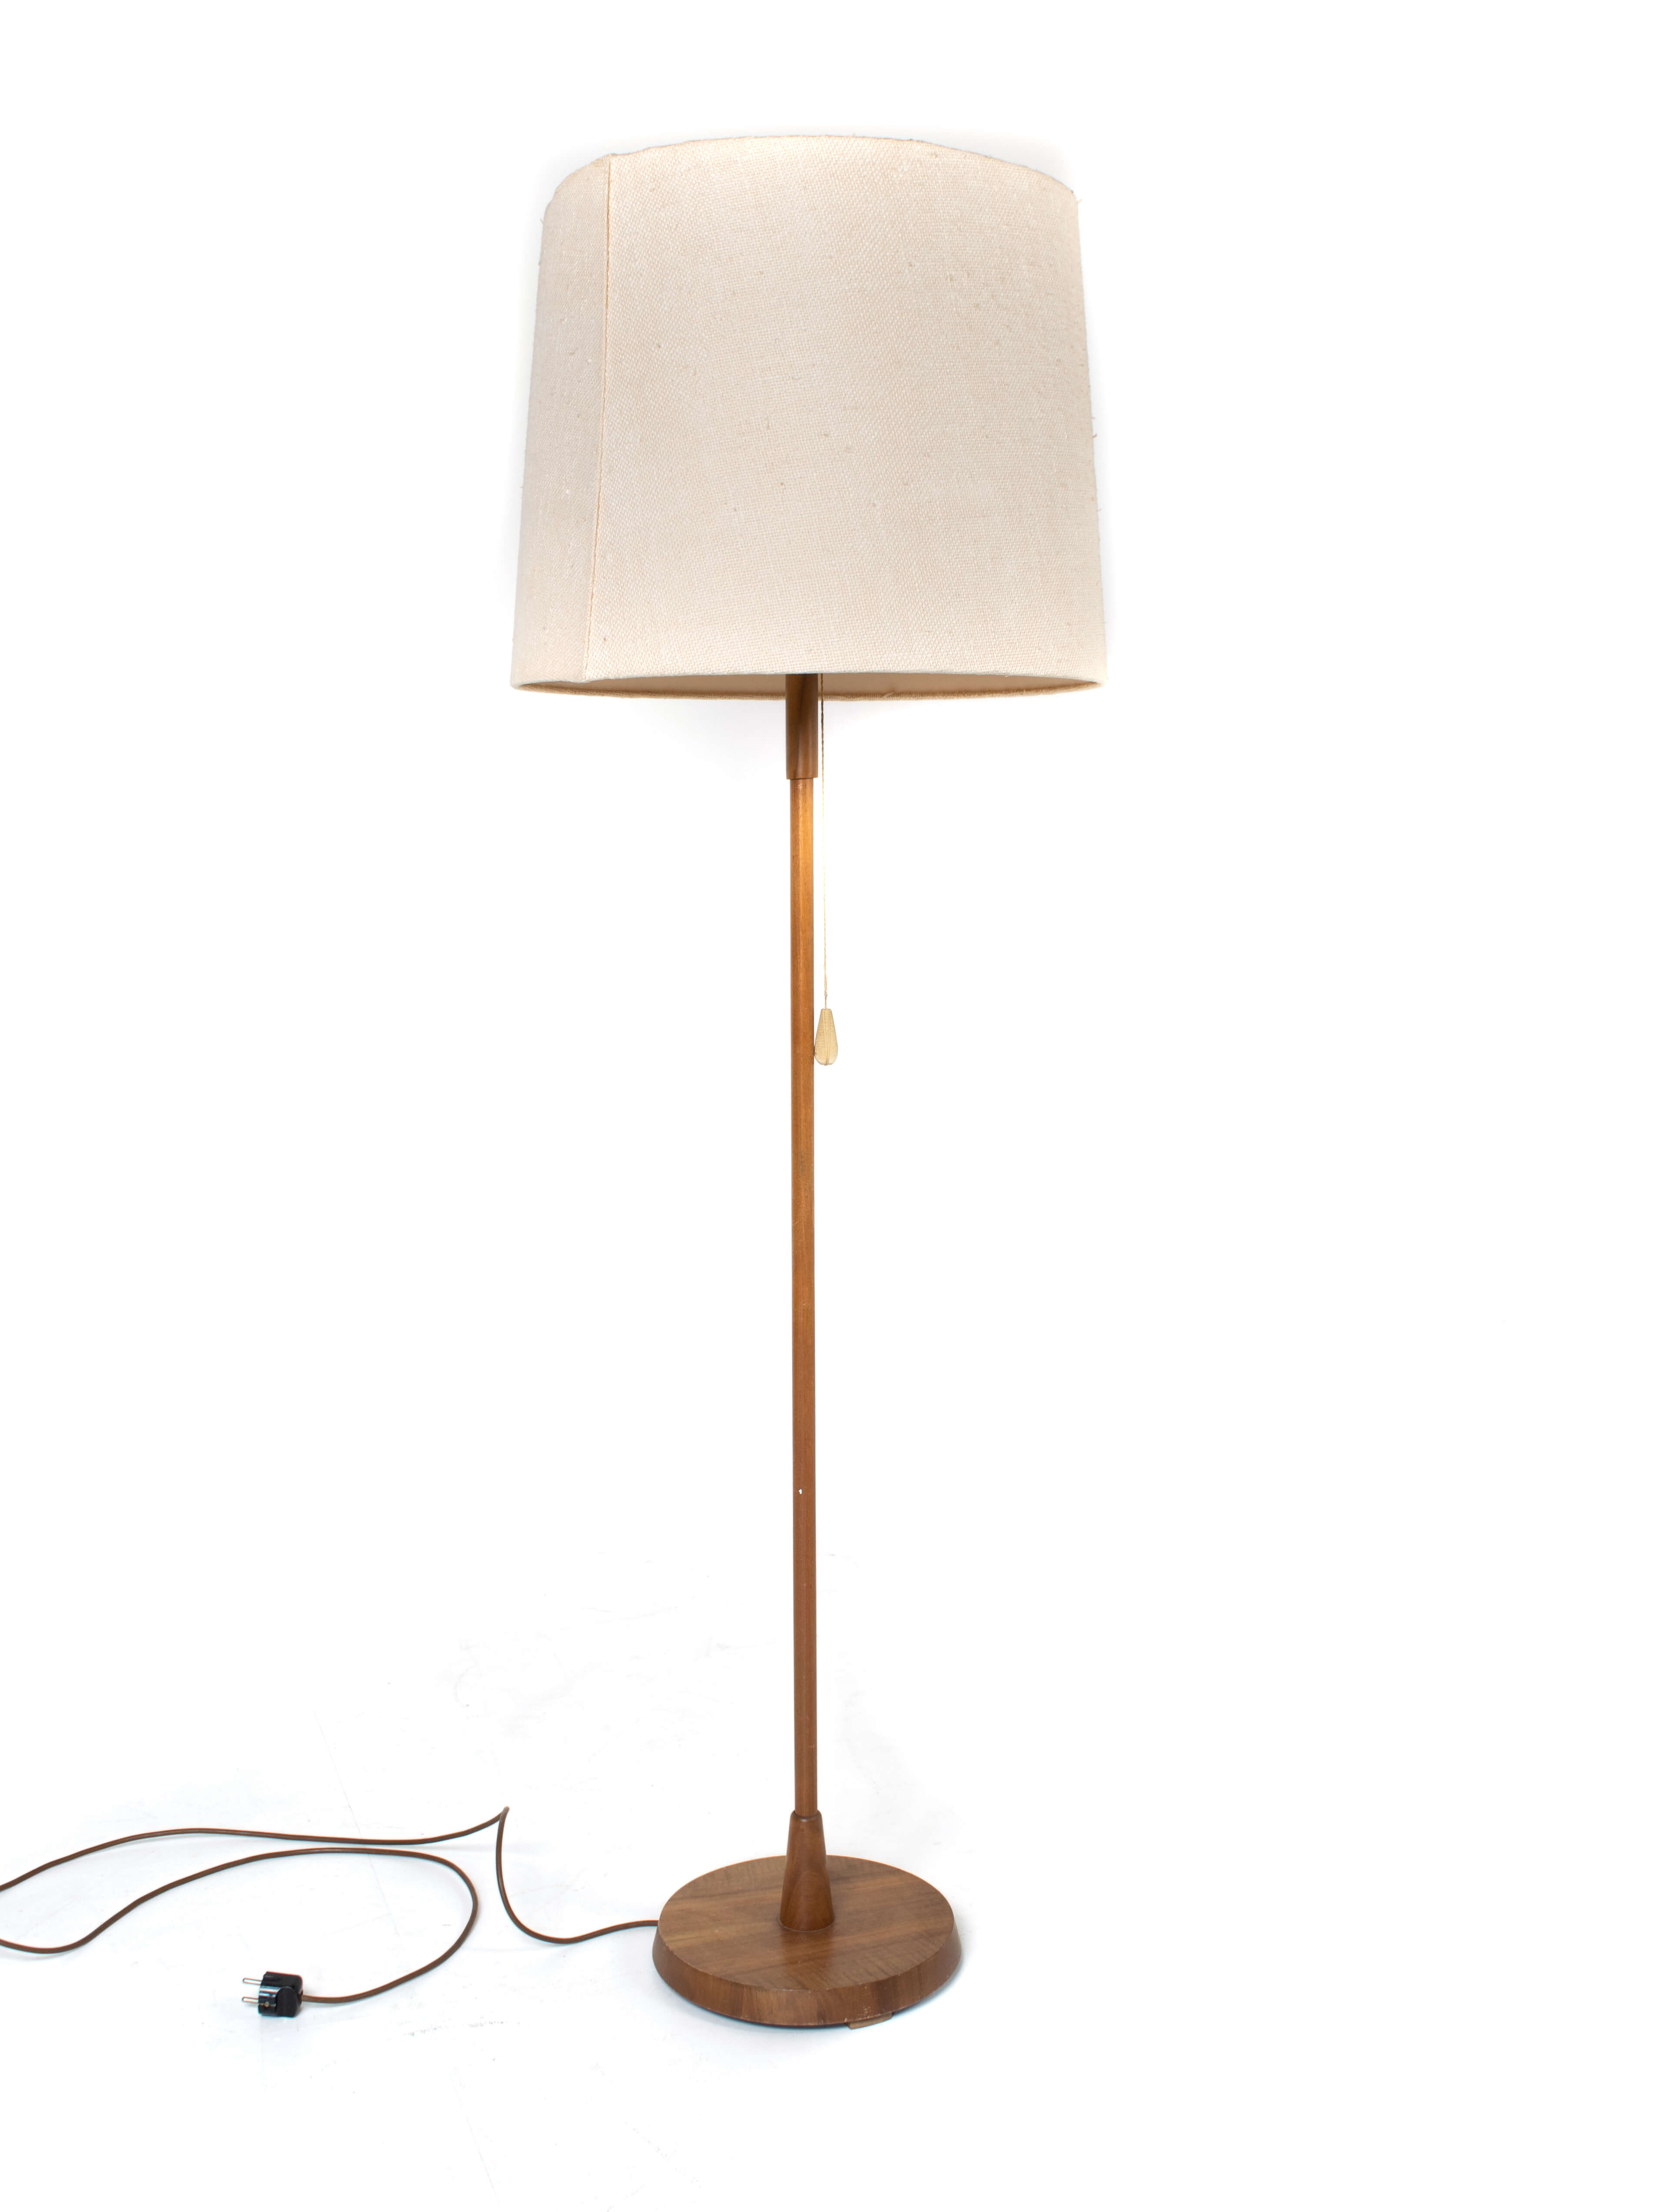 Temde Floor Lamp in Teak and Fabric, Germany 1970s